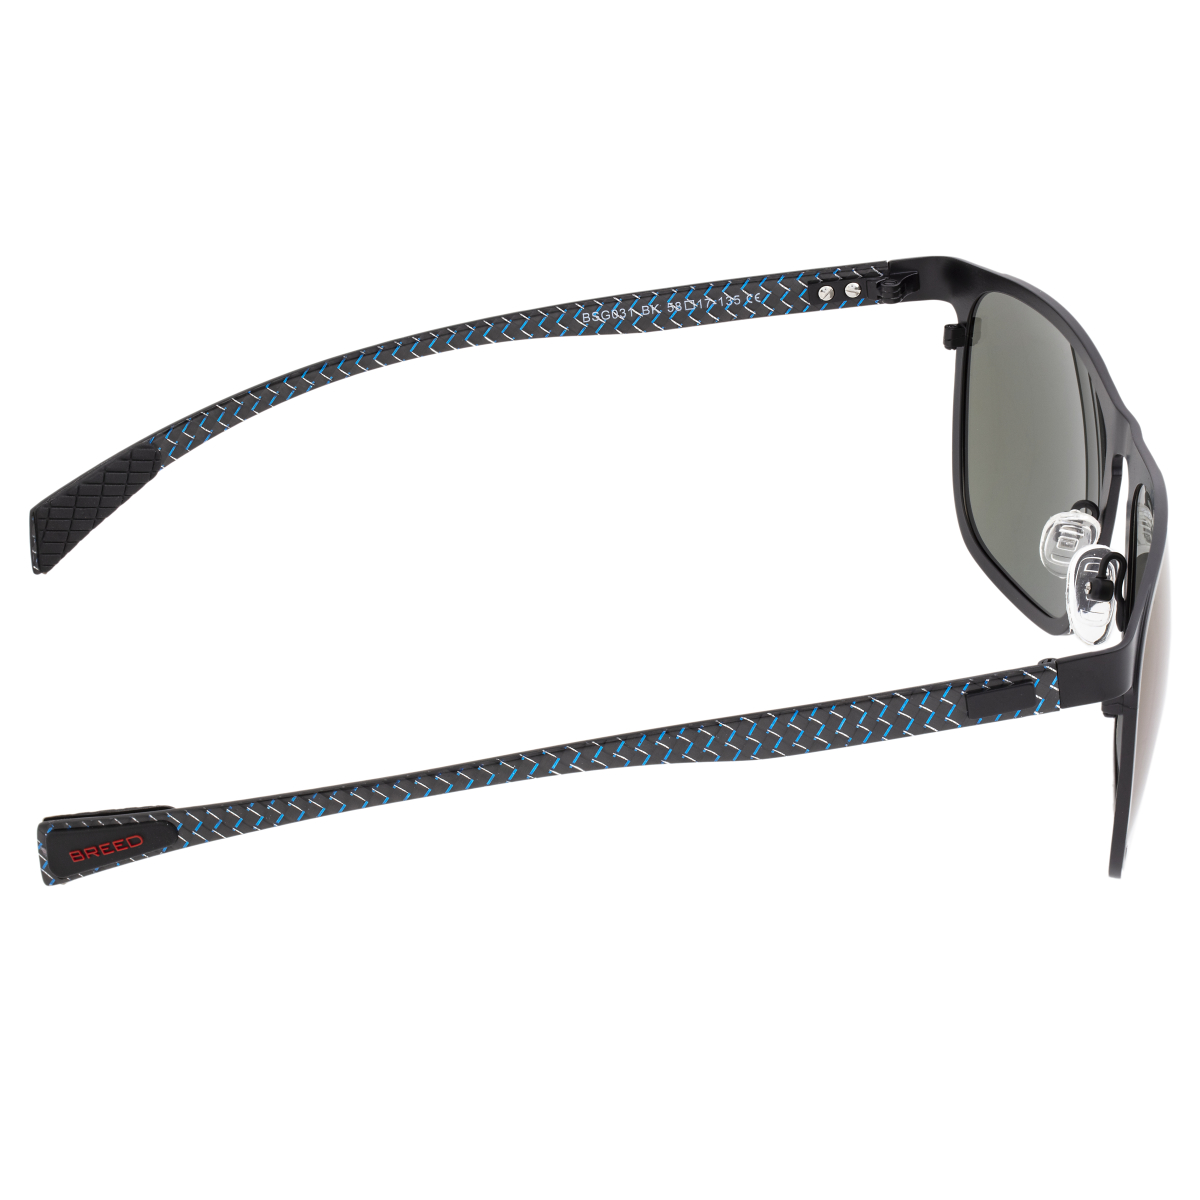 007edd25c315 Breed Capricorn Titanium Polarized Sunglasses - Black/Blue BSG031BK ...